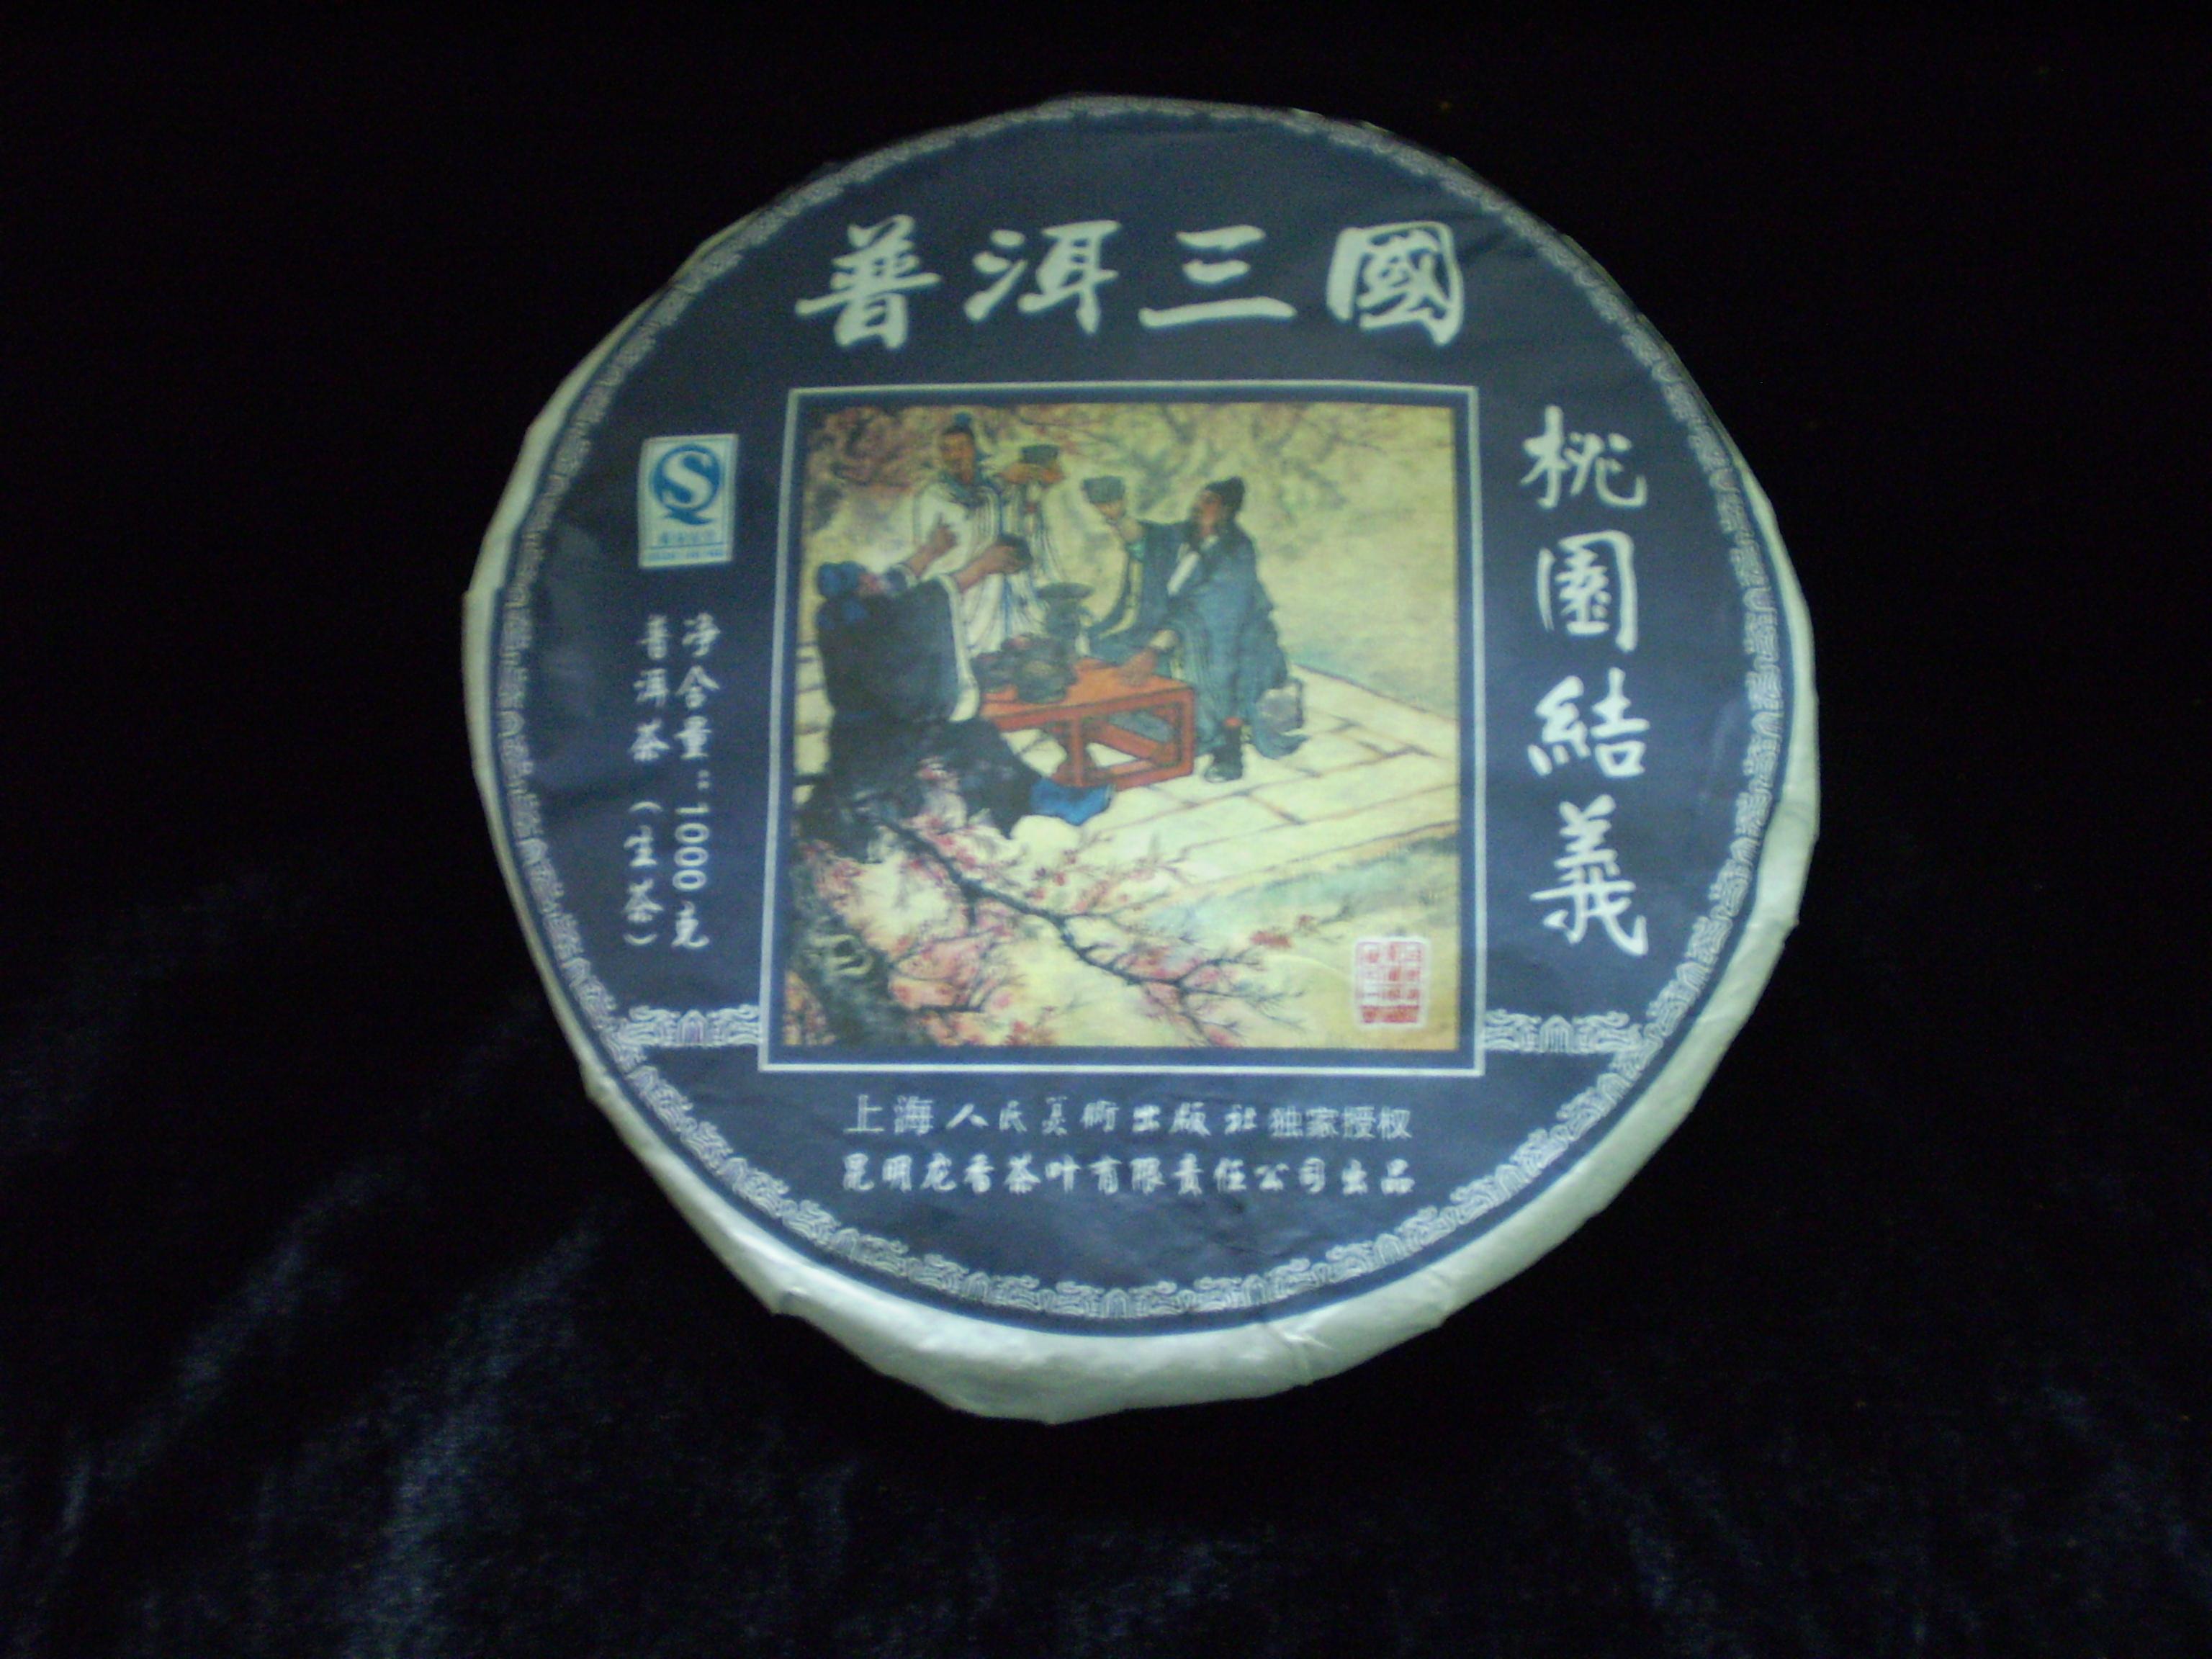 プーアル茶 三国志 桃園結儀